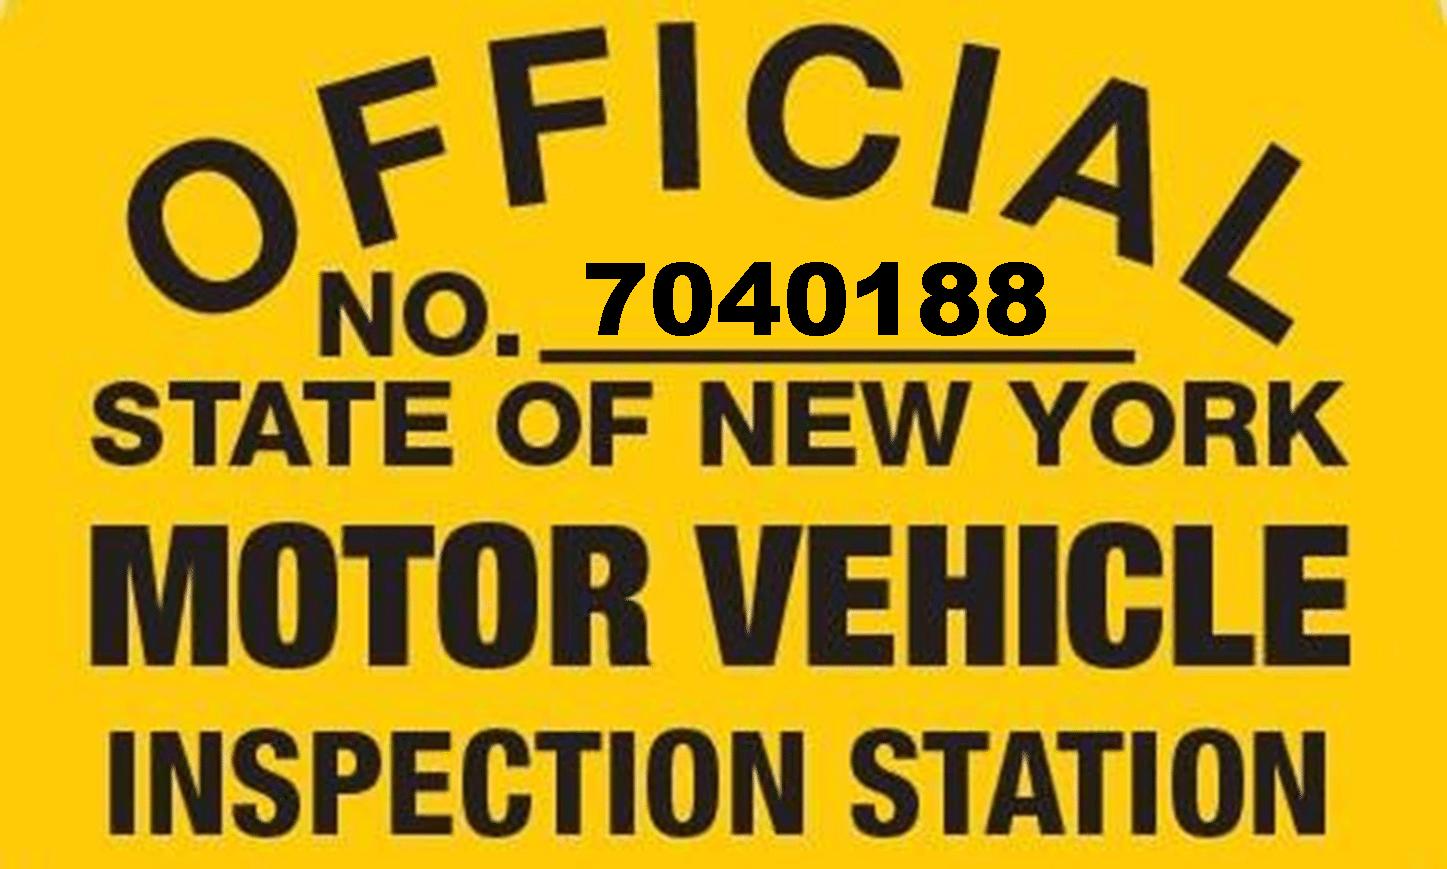 NYS Motor Vehicle Inspections - Glendale NY